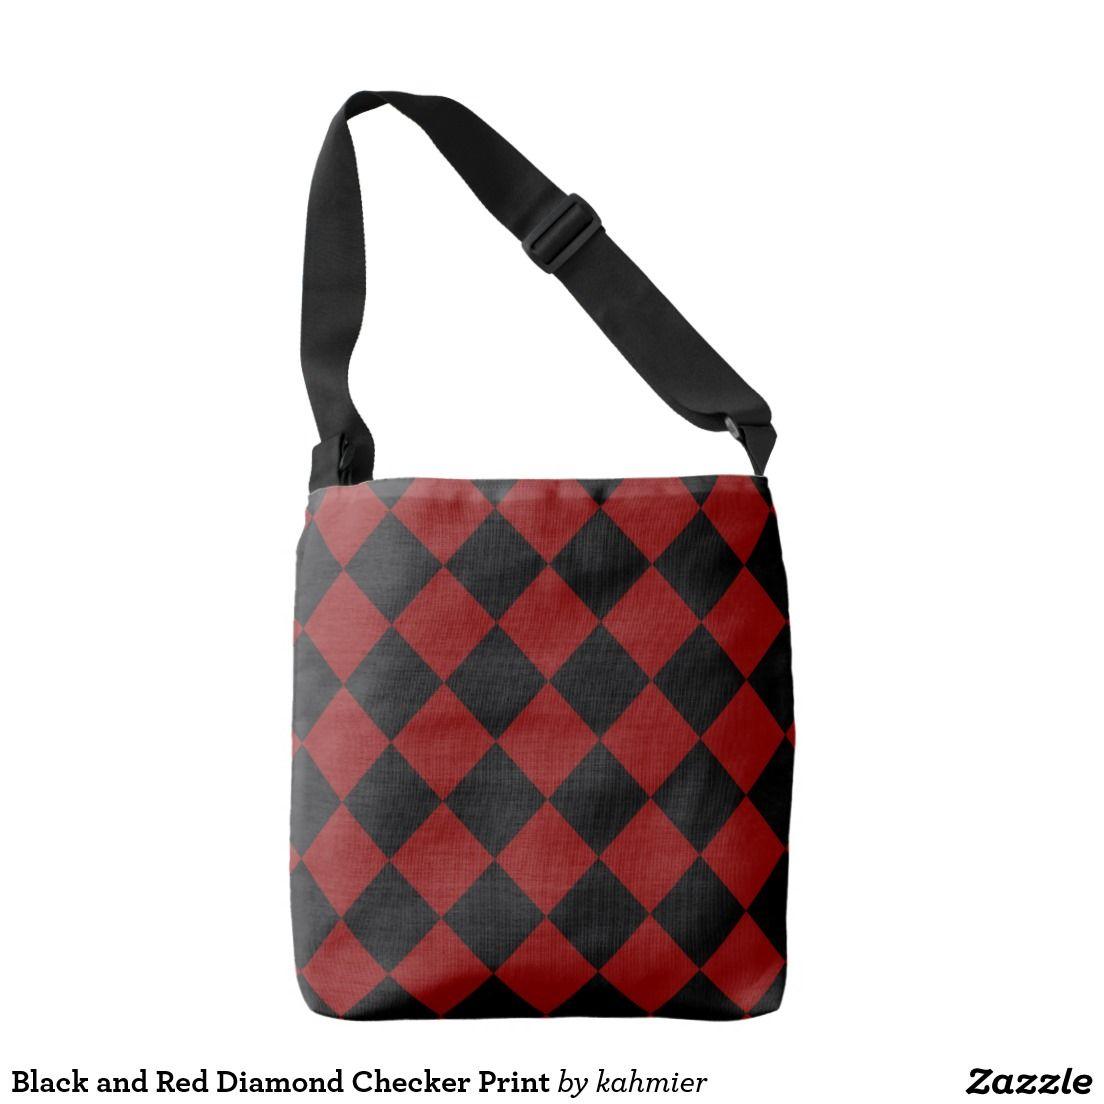 50f6f95ddc168 Black and Red Diamond Checker Print Crossbody Bag   Zazzle.com ...